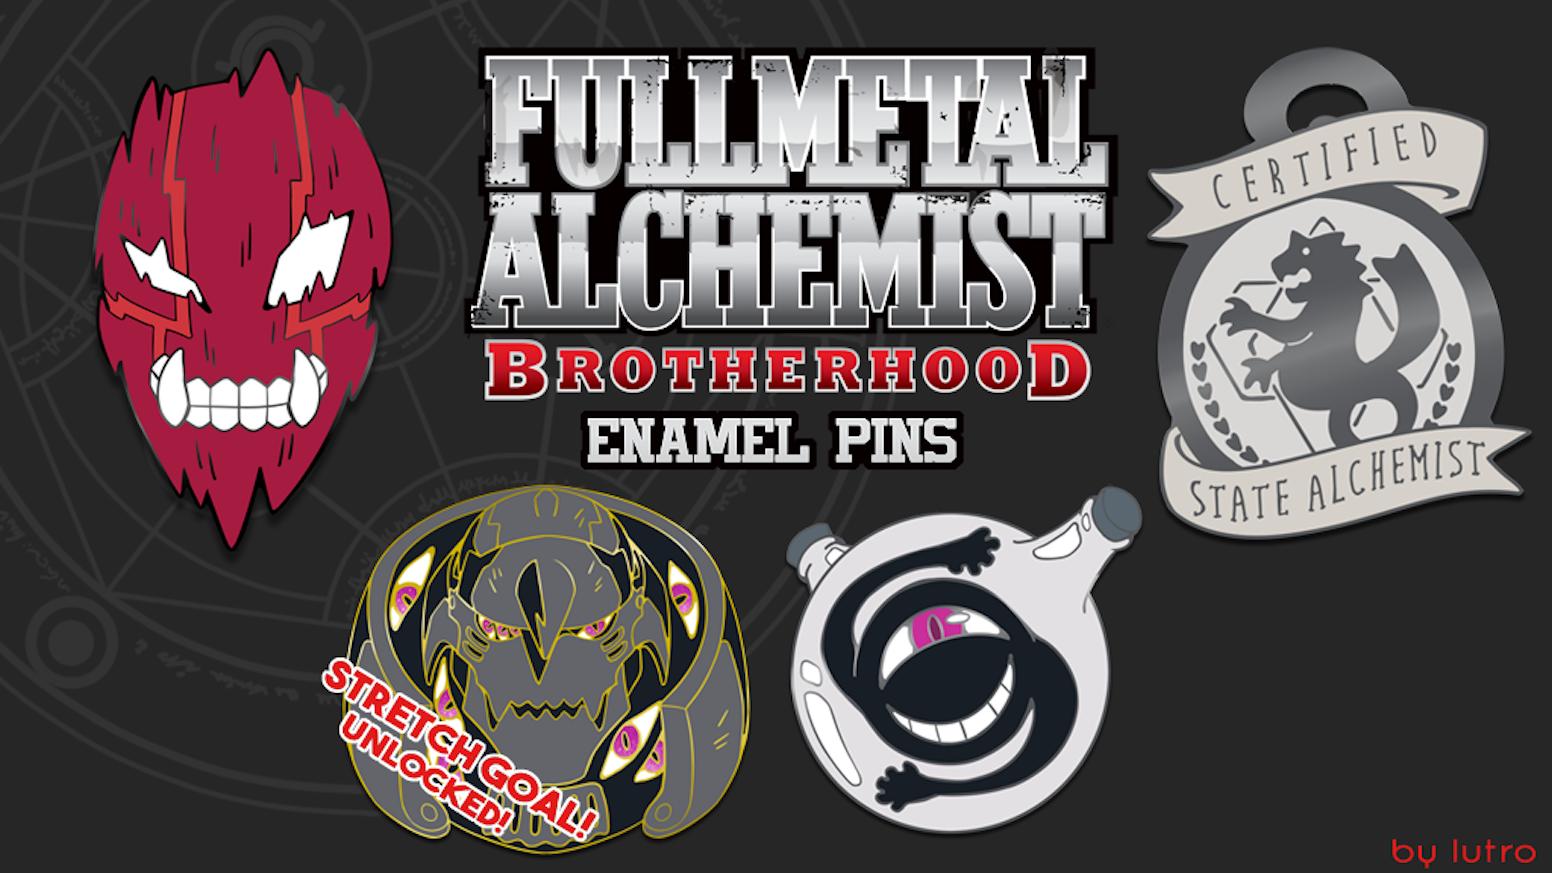 Fullmetal Alchemist: Brotherhood Enamel Pins by Oliver Lutro